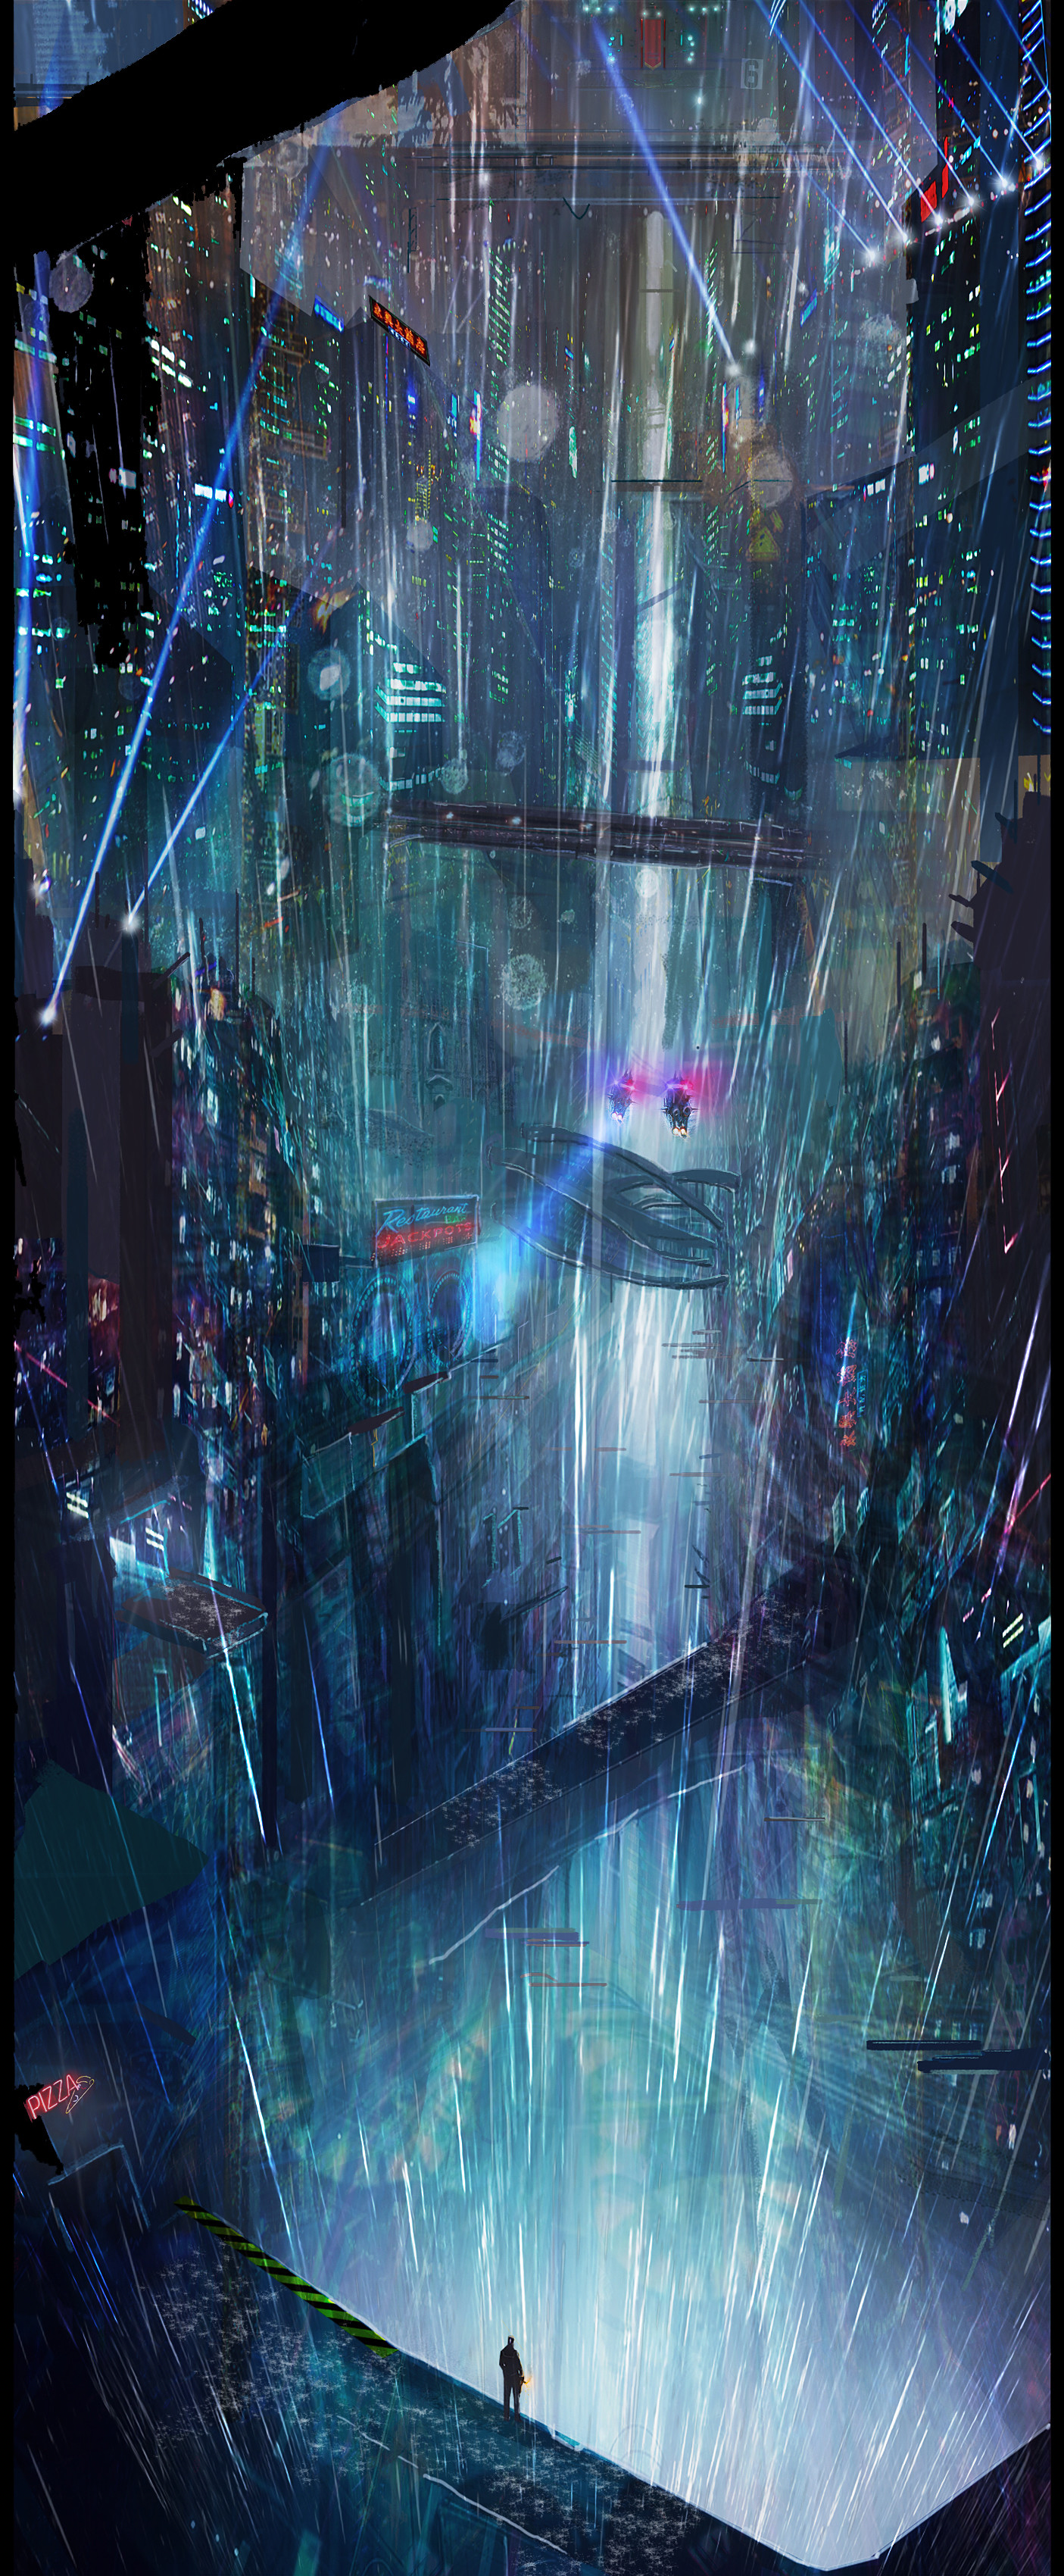 Michael morris virtualreality5